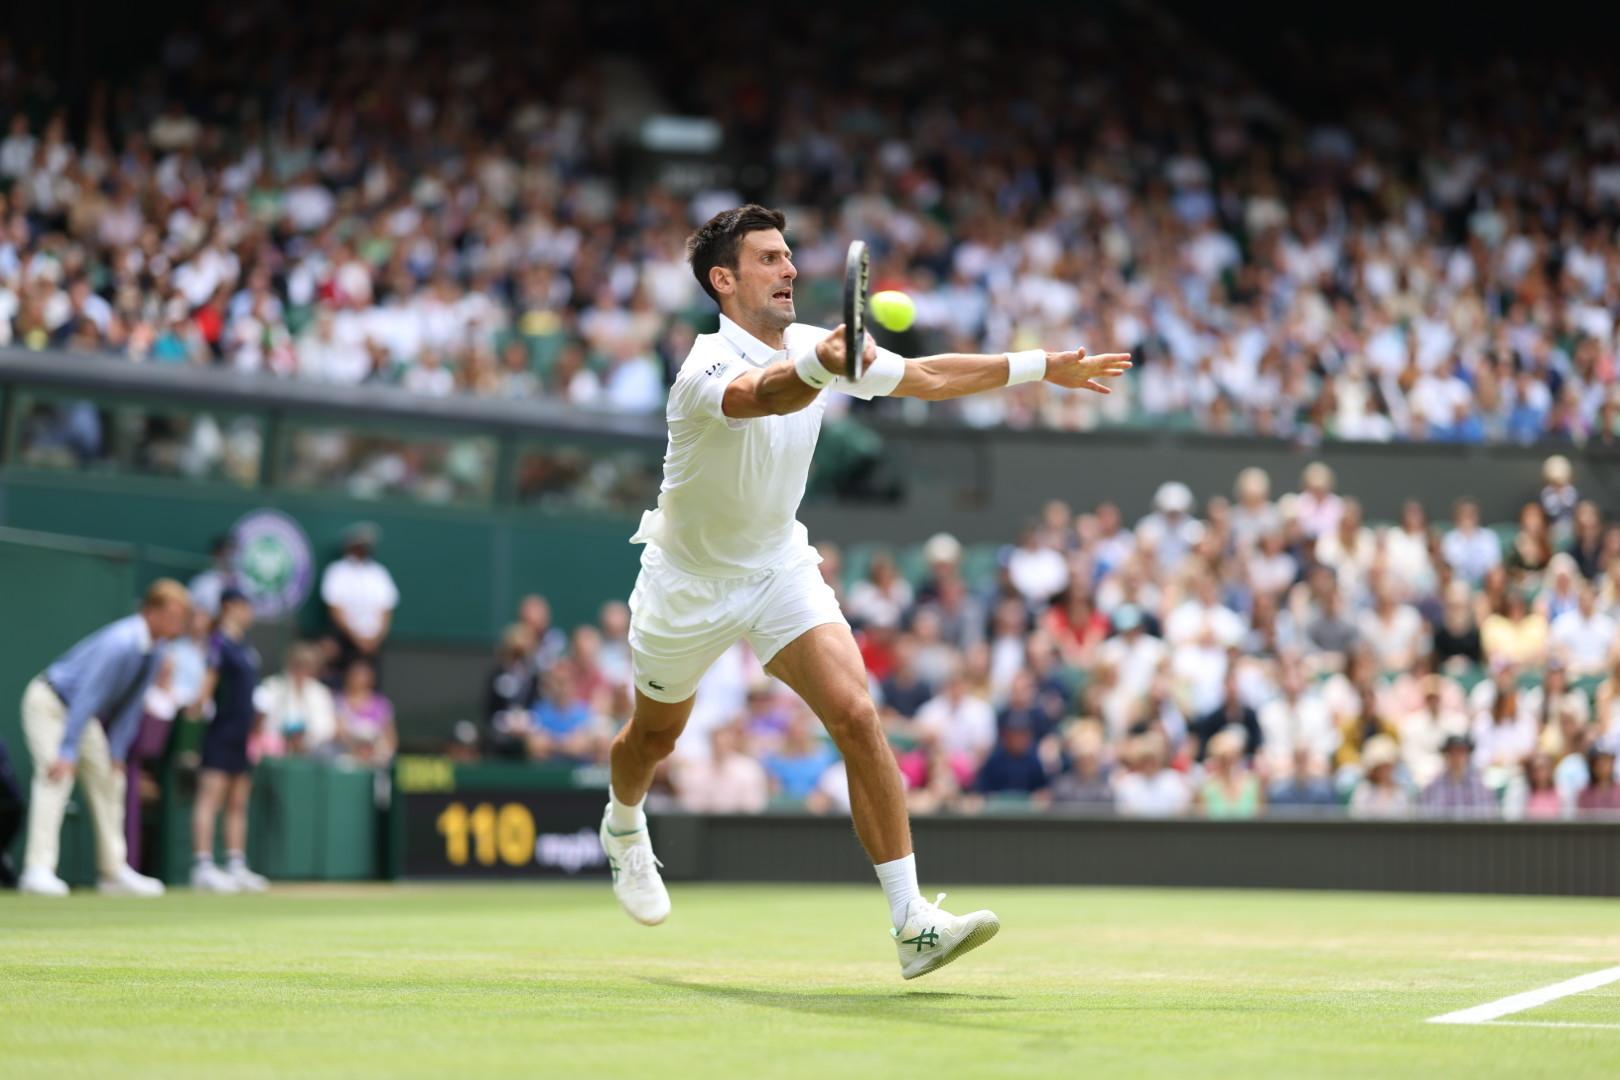 foto Wimbledon Facebook 1 1 - Đoković 50. v četrtfinalu na Grand Slamih, Bartyjeva prvič v Wimbledonu